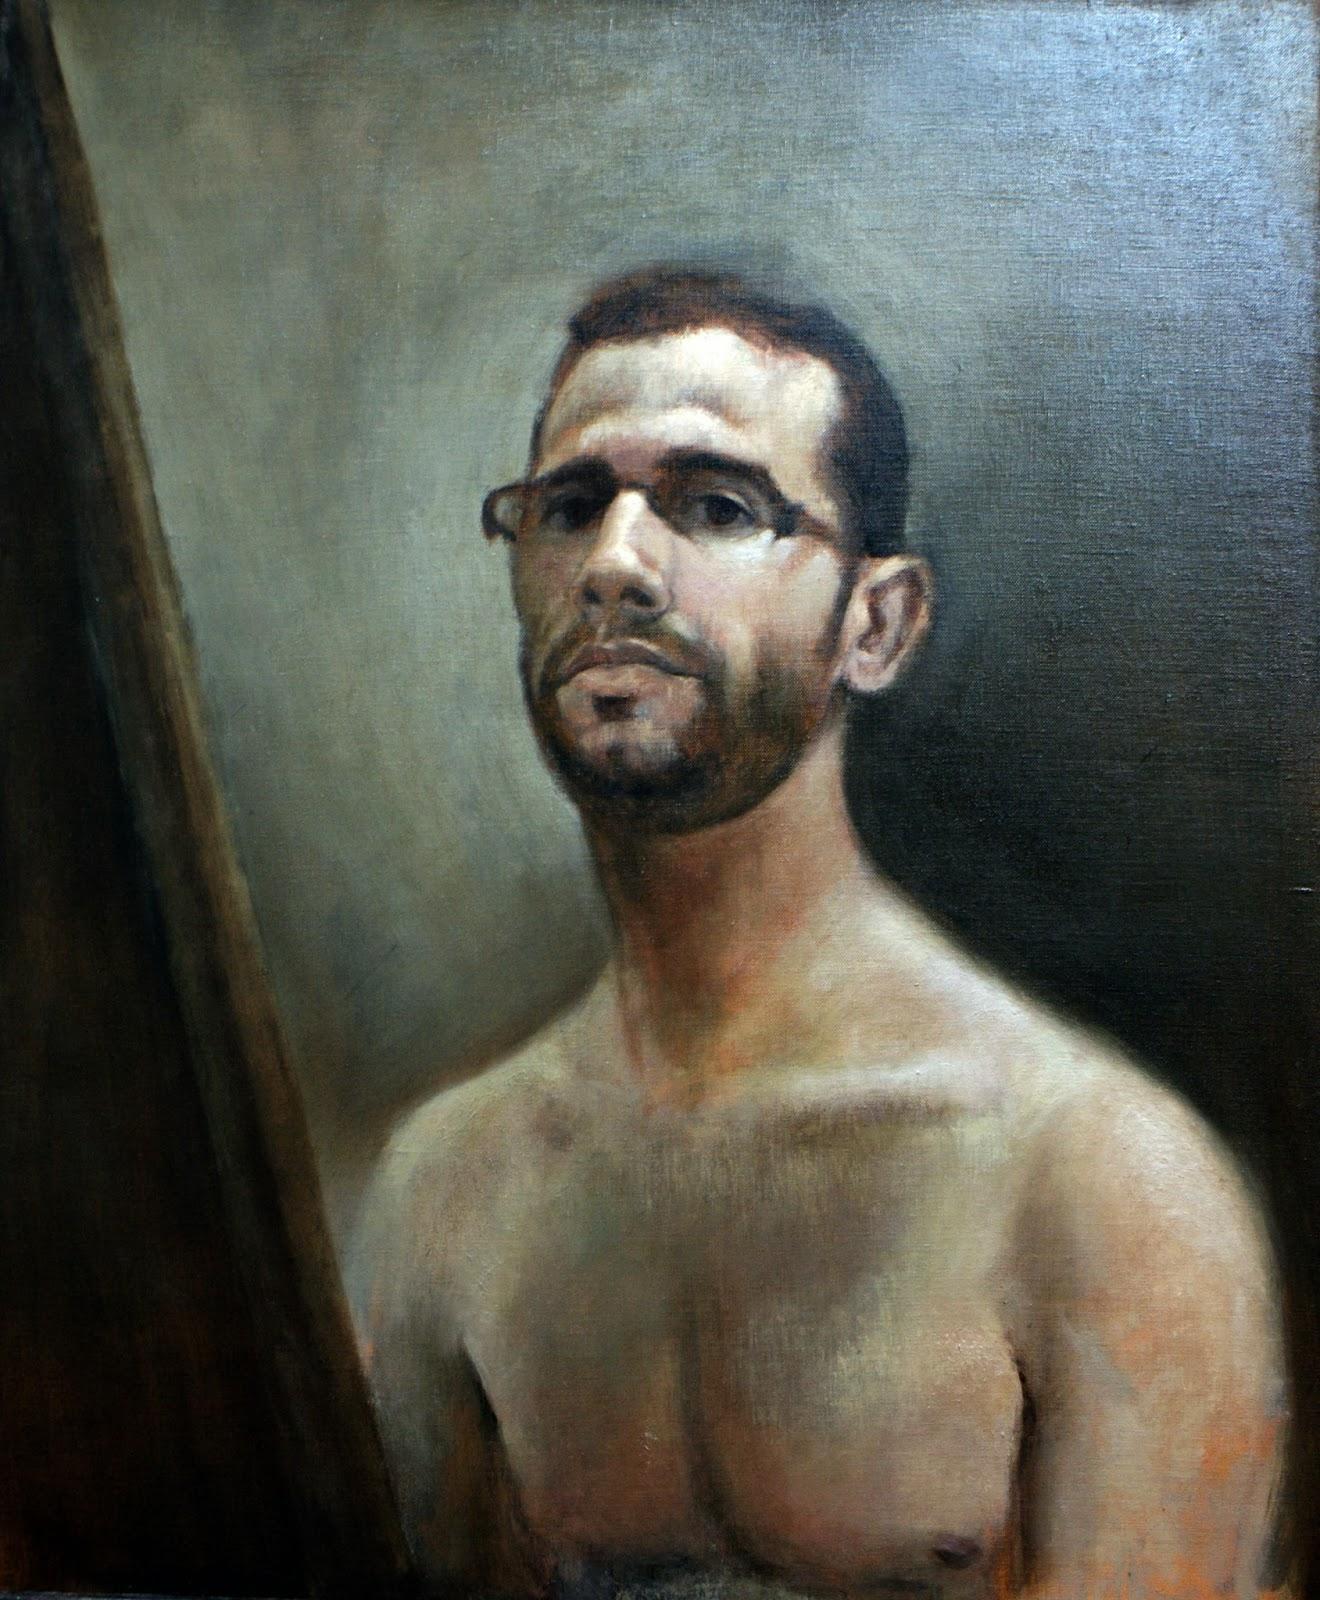 Pintores valencianos alejandro mart nez benet - Pintor valenciano ...